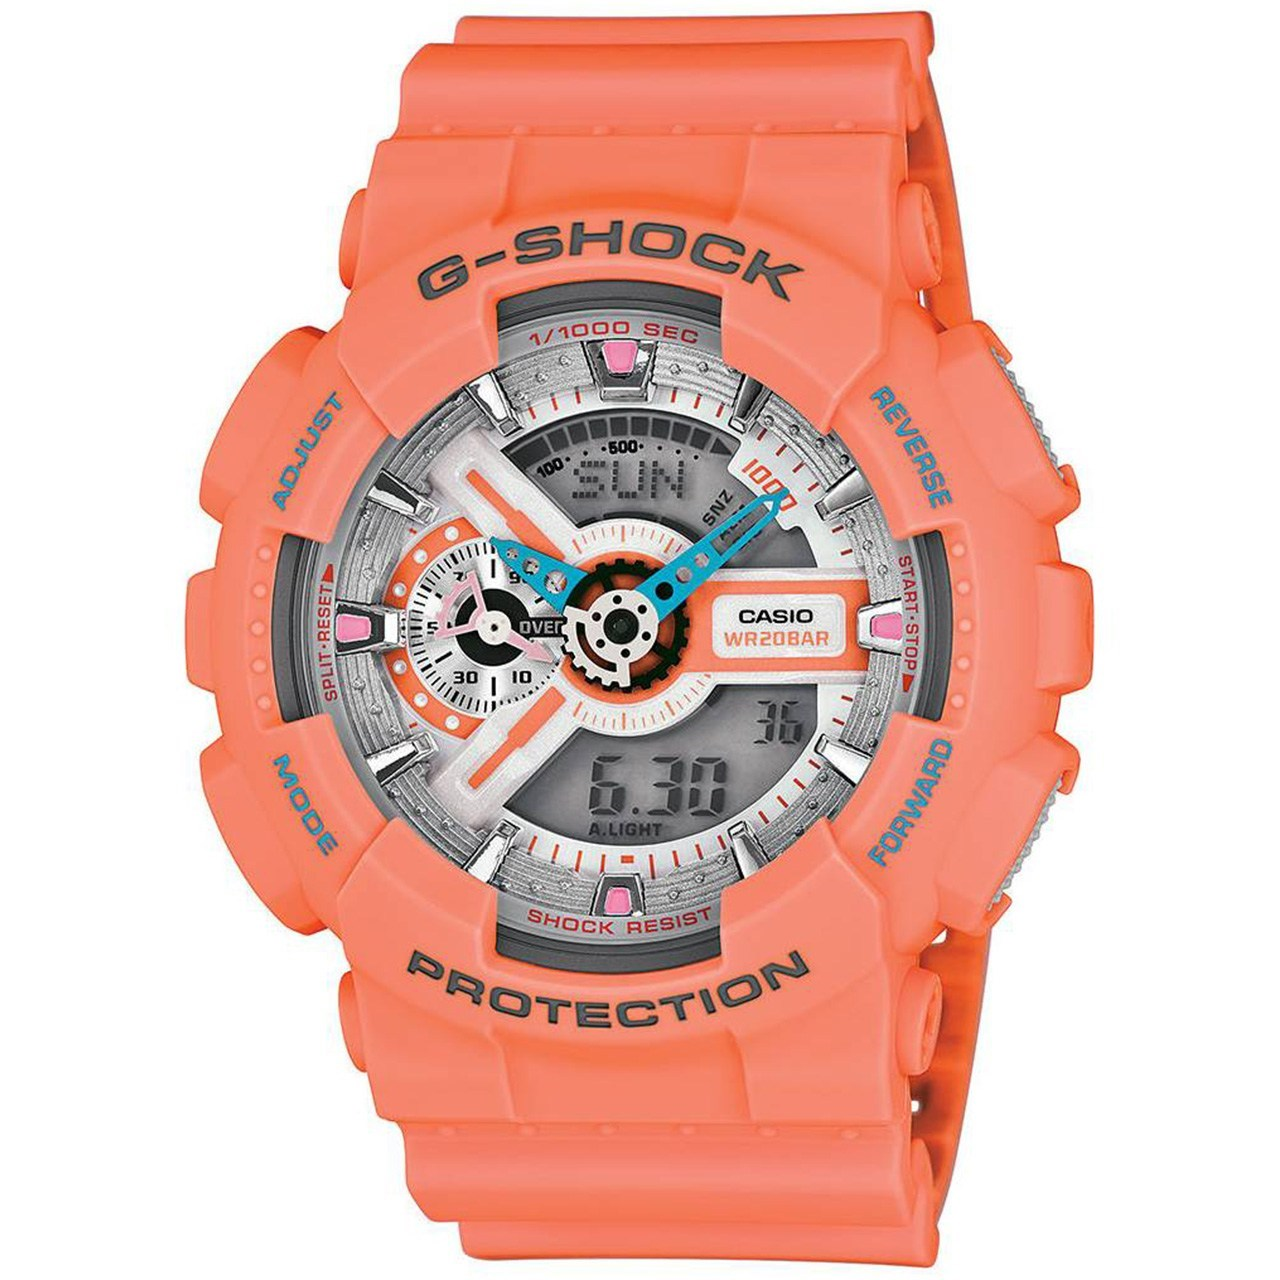 ساعت مچی دیجیتال مردانه کاسیو مدل G-Shock GA-110DN-4ADR